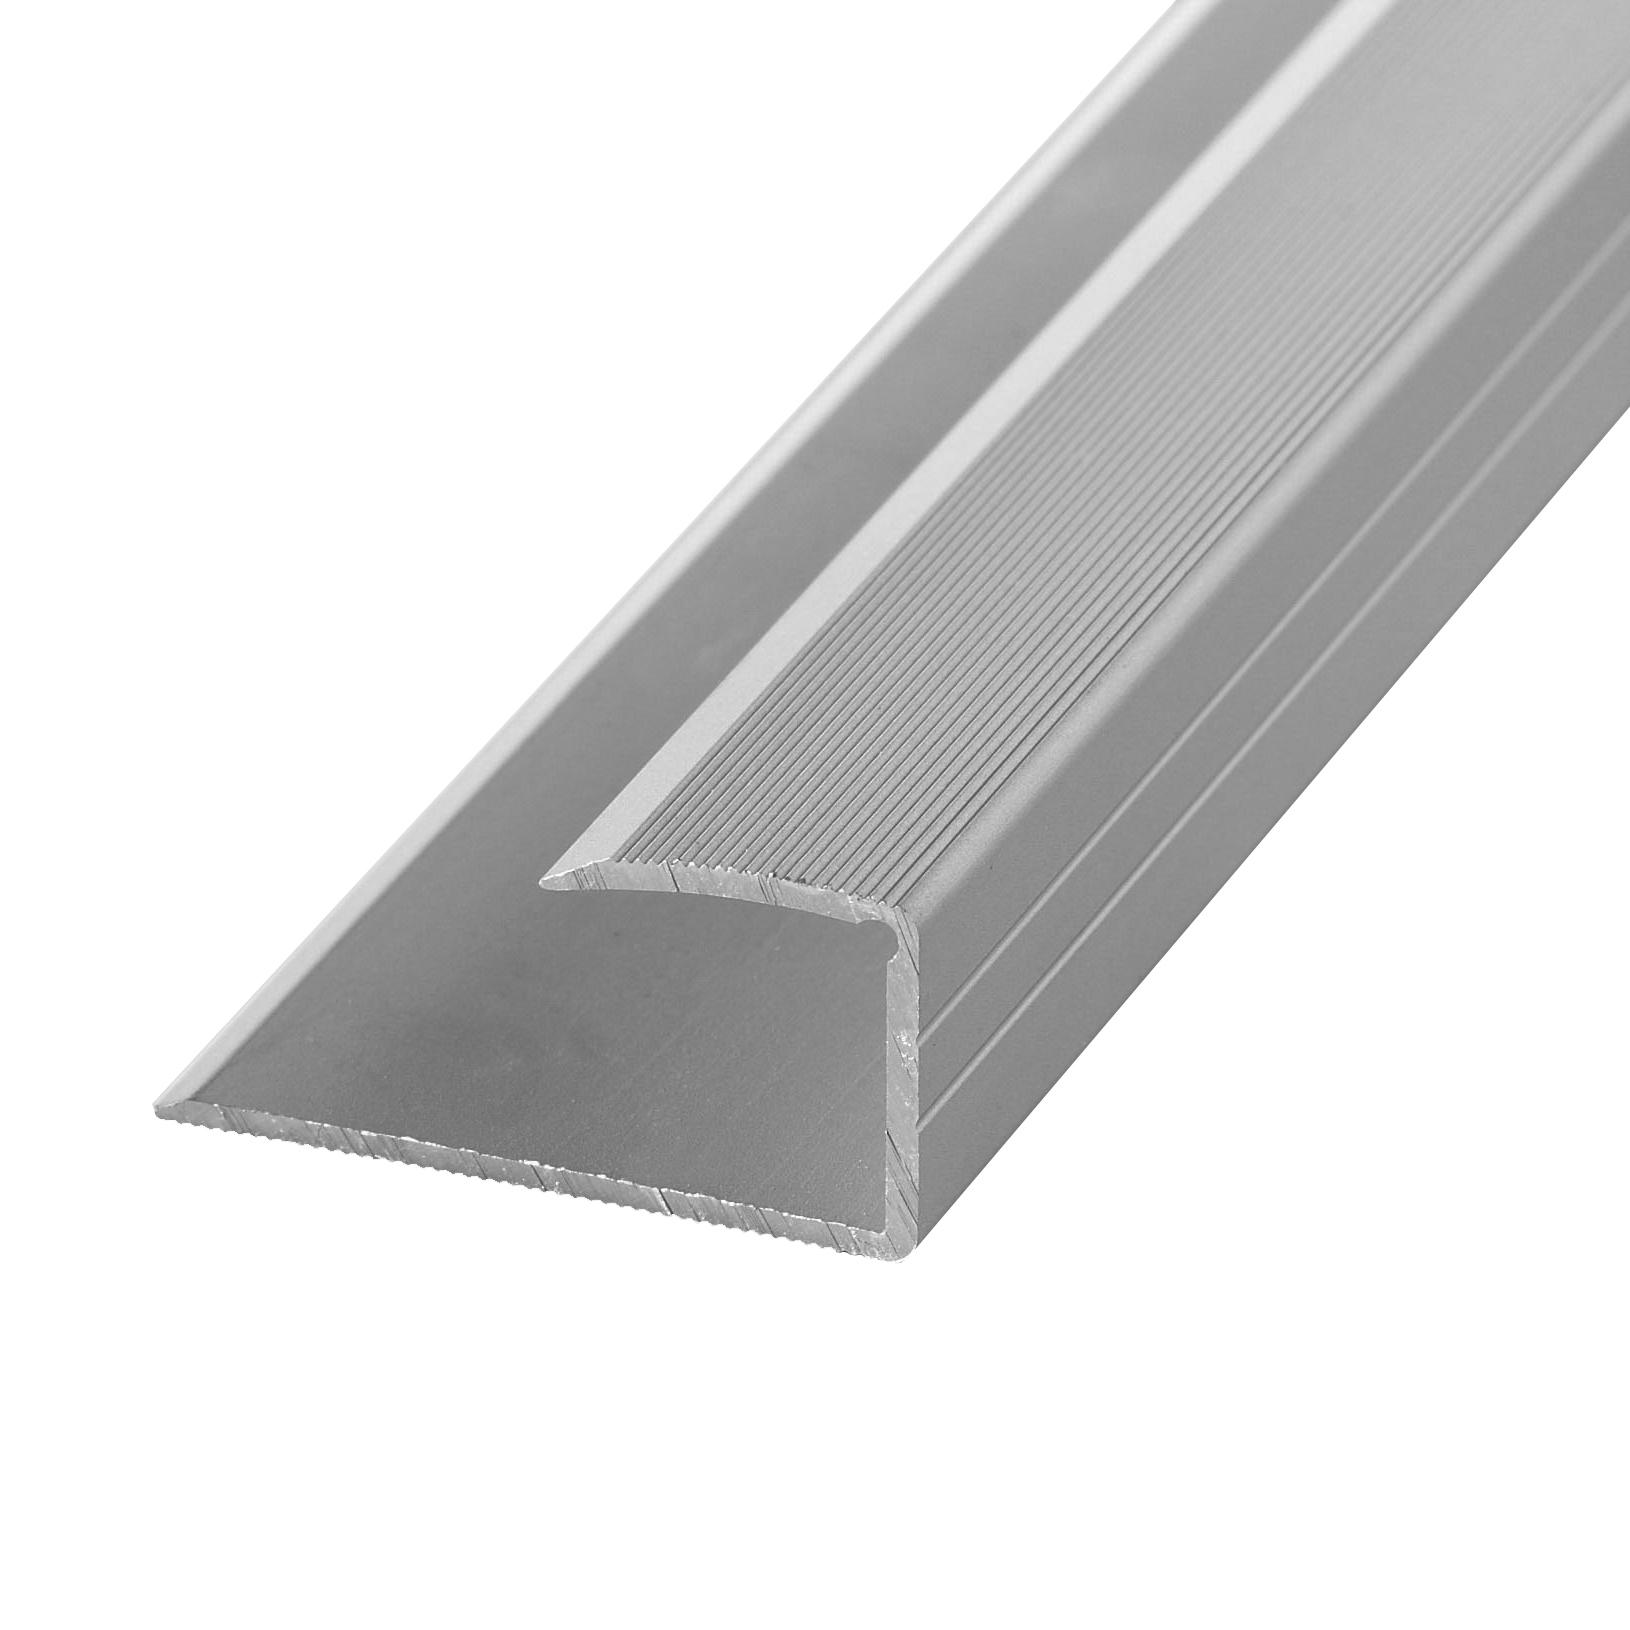 Edging profile 14-16mm alu stainl. steel